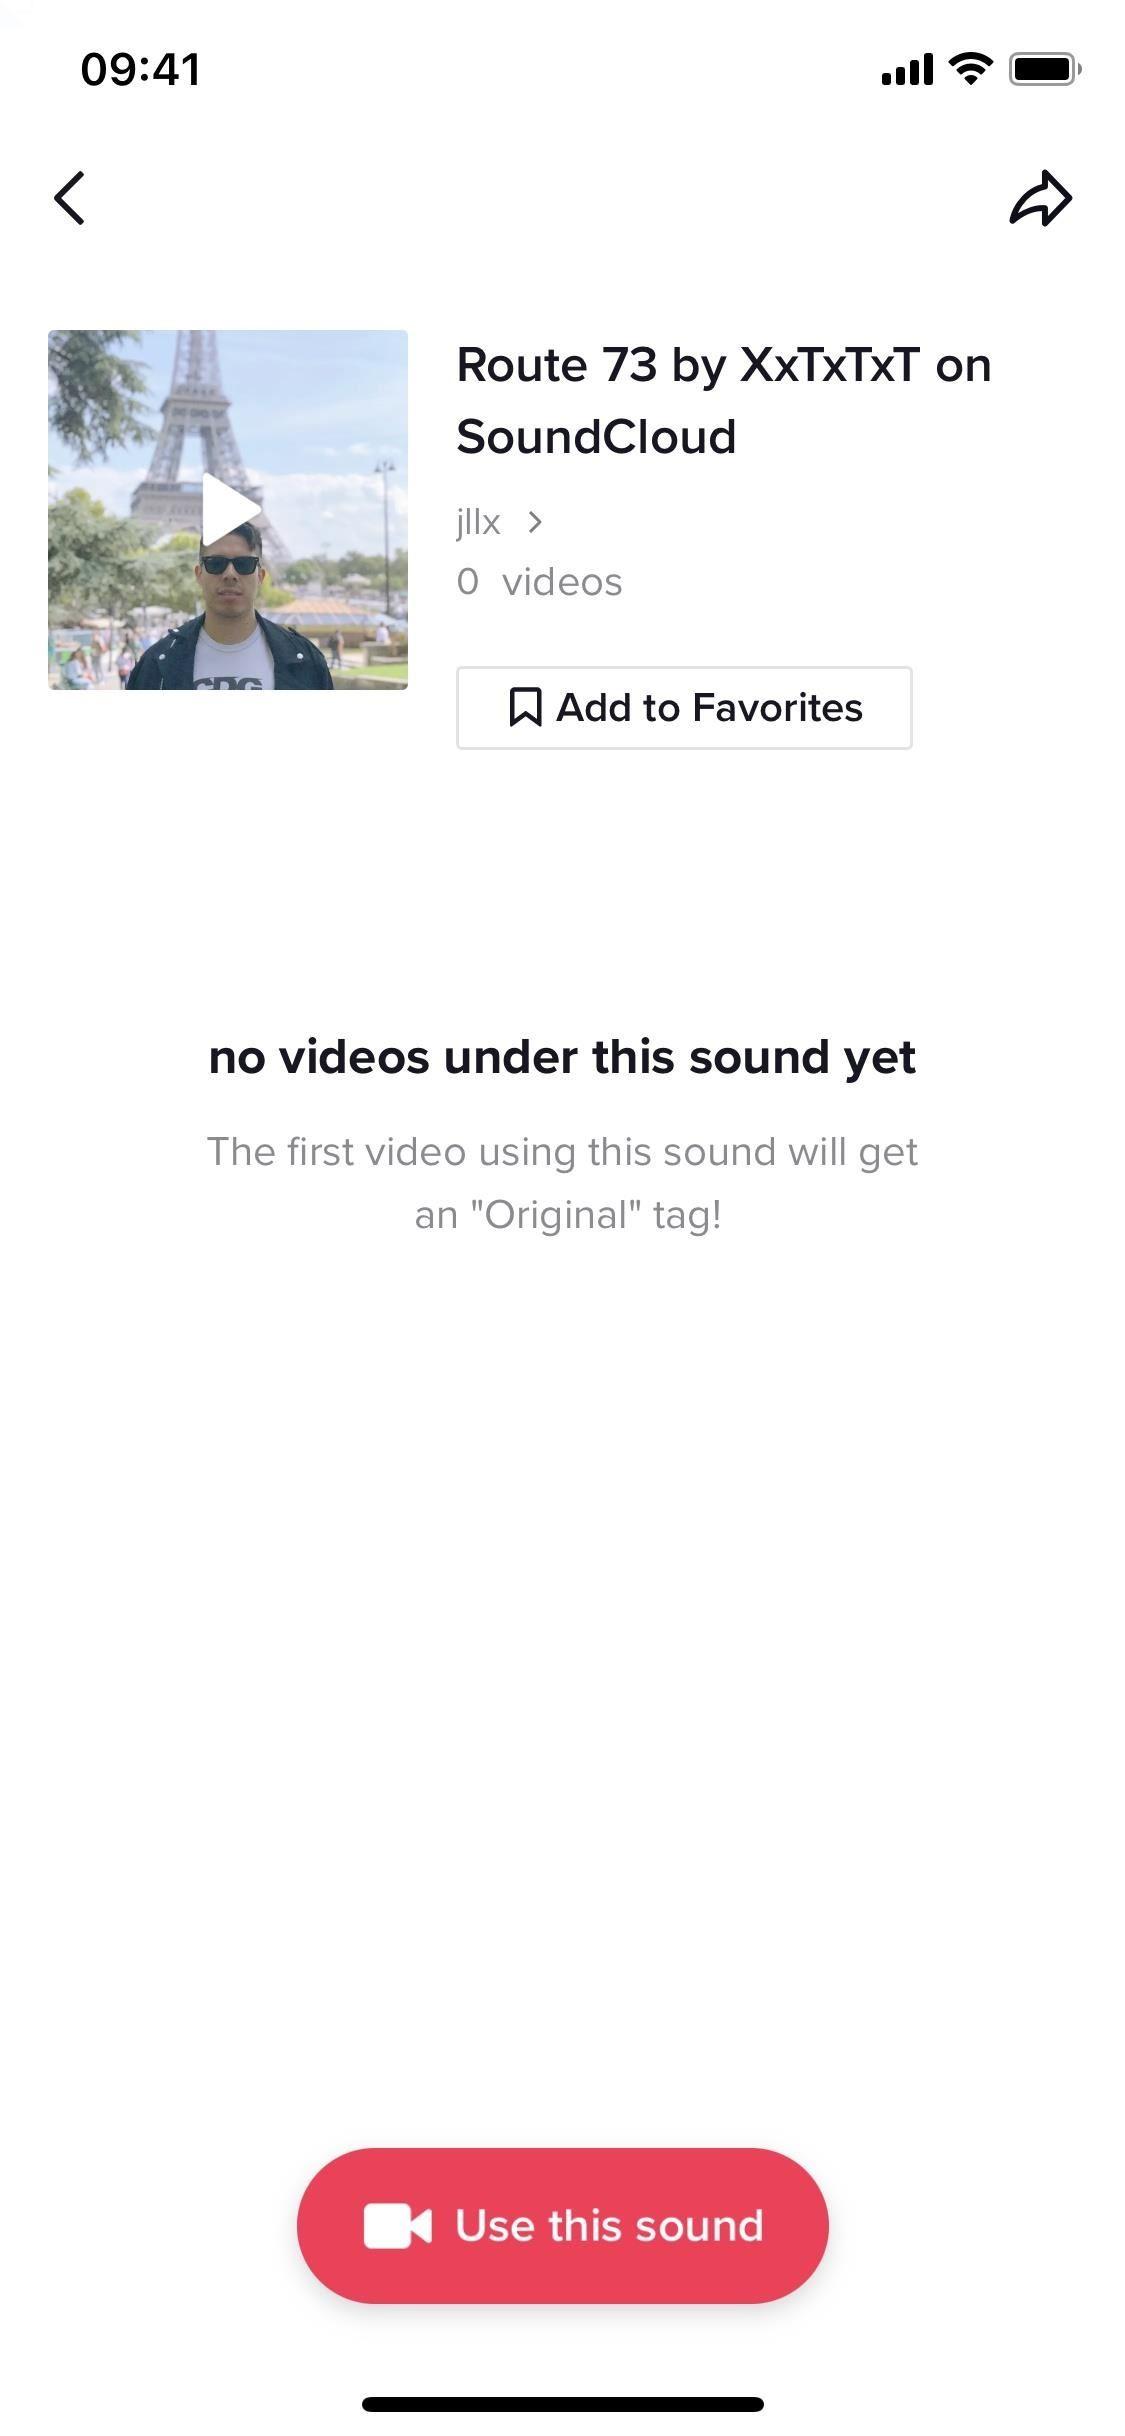 Rename Your Original Sound to Make Your TikTok Video More Shareable